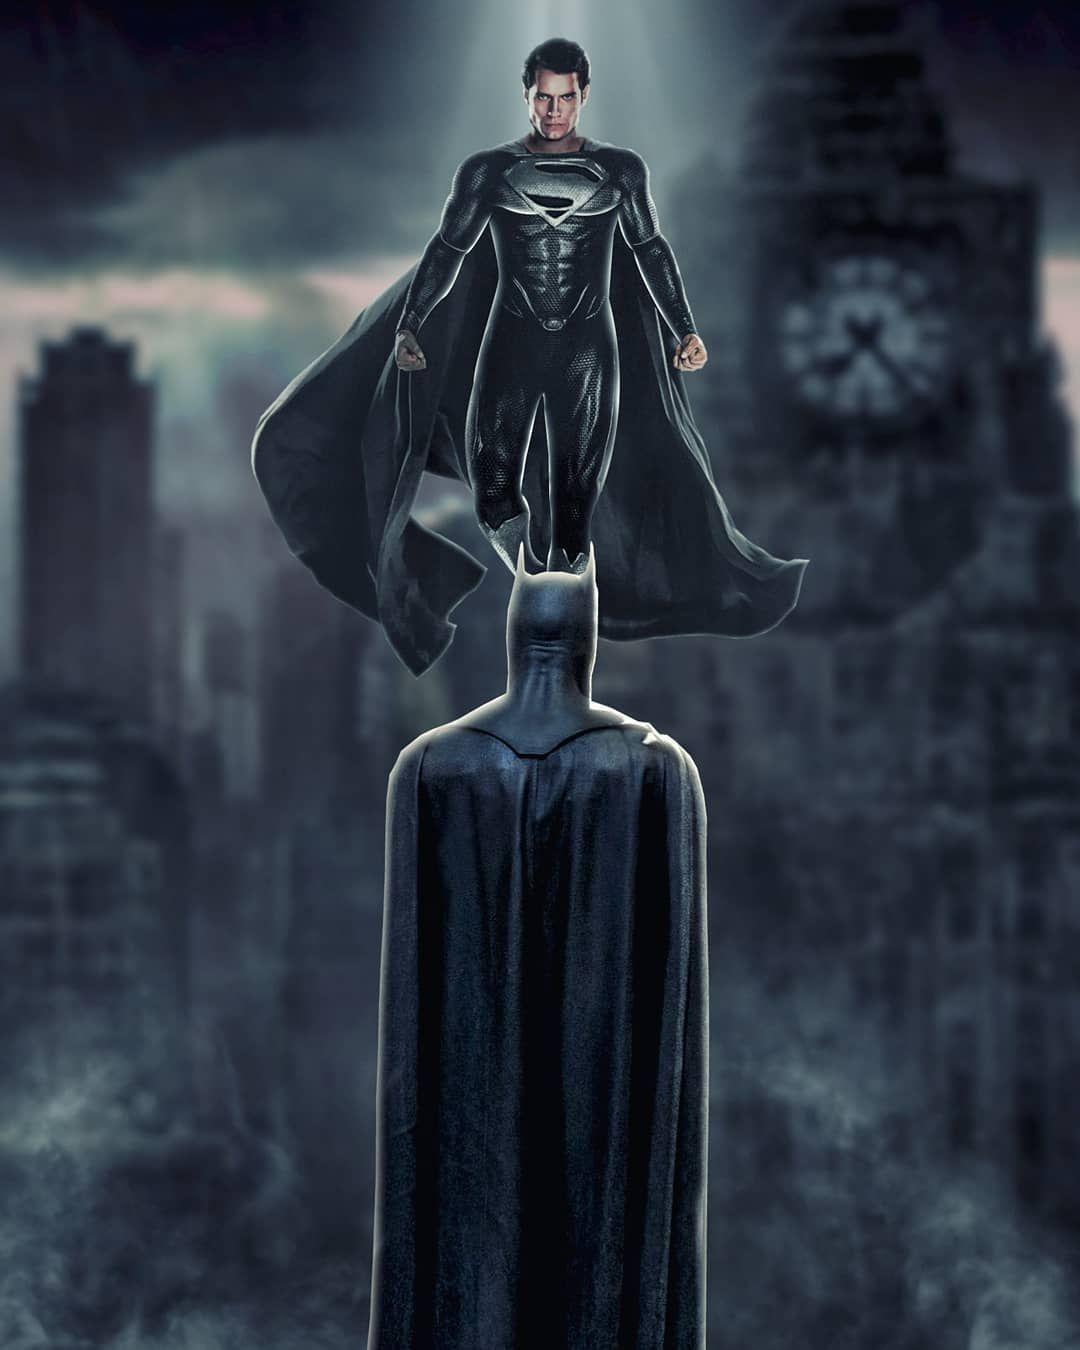 Batman V Superman Black Superman Superman Batman Henrykavill Brucewayne Benaffleck Dccomic Black Superman Superman Wallpaper Batman Superman Wonder Woman